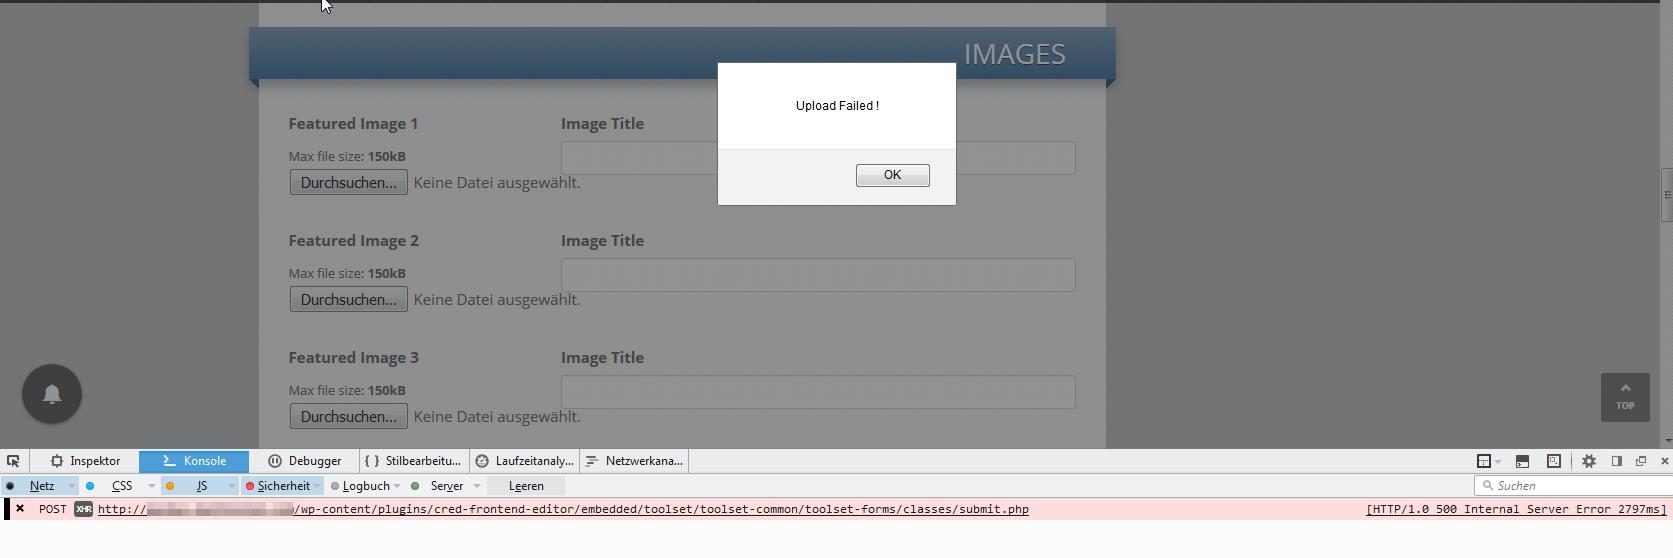 File upload not working: 500 internal server error on custom